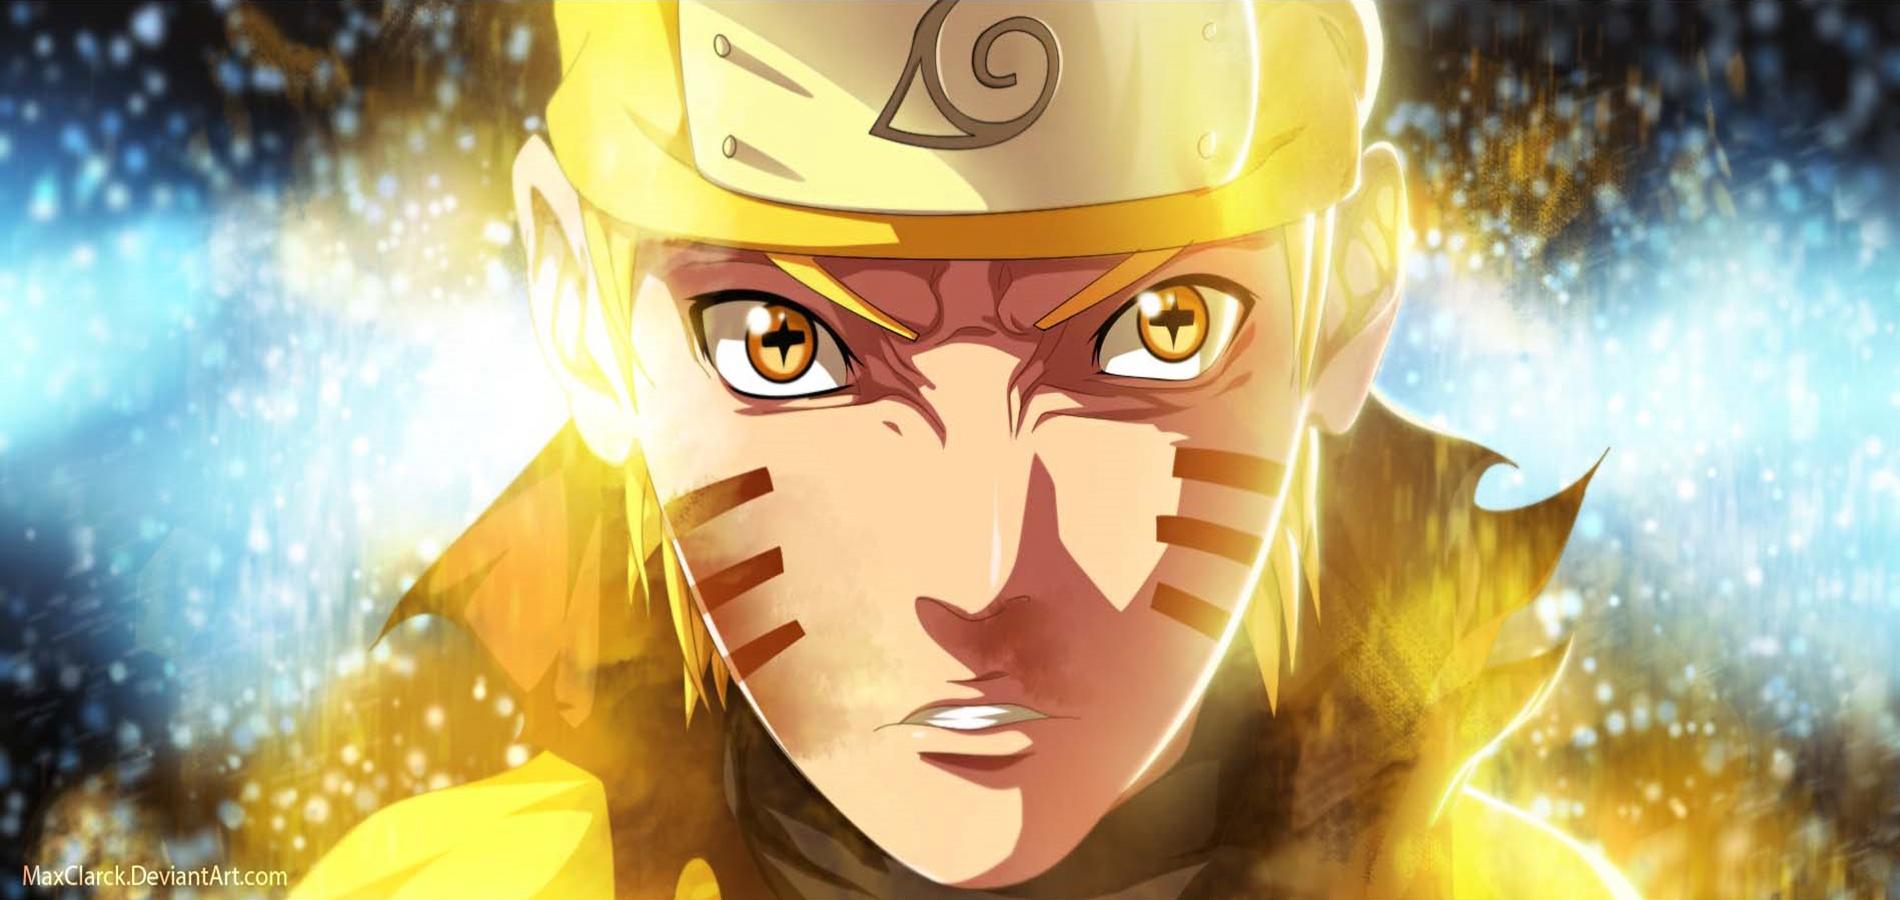 Popular Wallpaper Naruto Ipad - 656752  Perfect Image Reference_32072.jpg